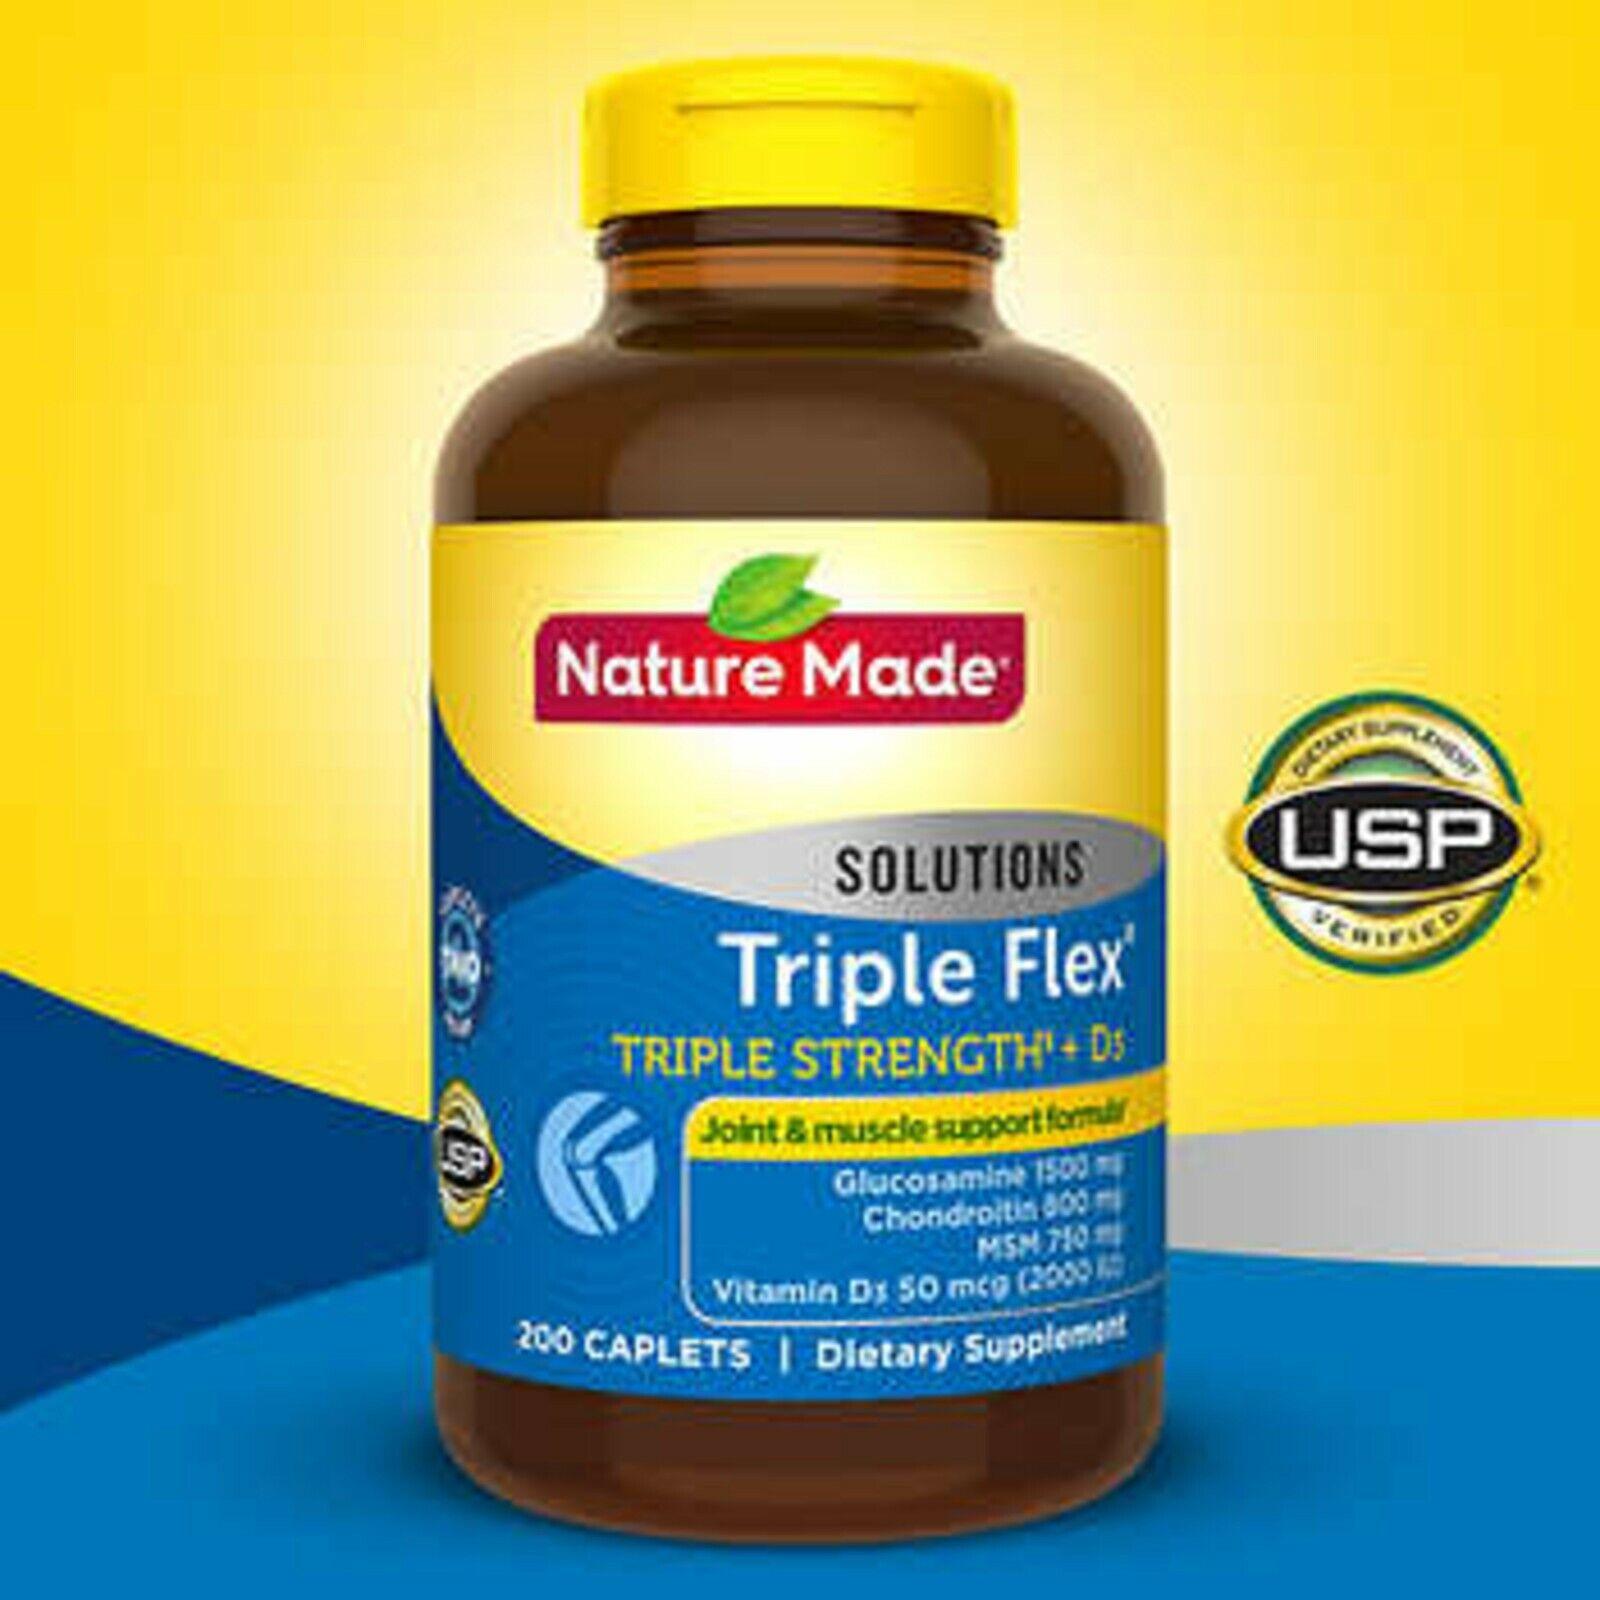 Nature Made TripleFlex 3 x Strength Glucosamine Chondroitin